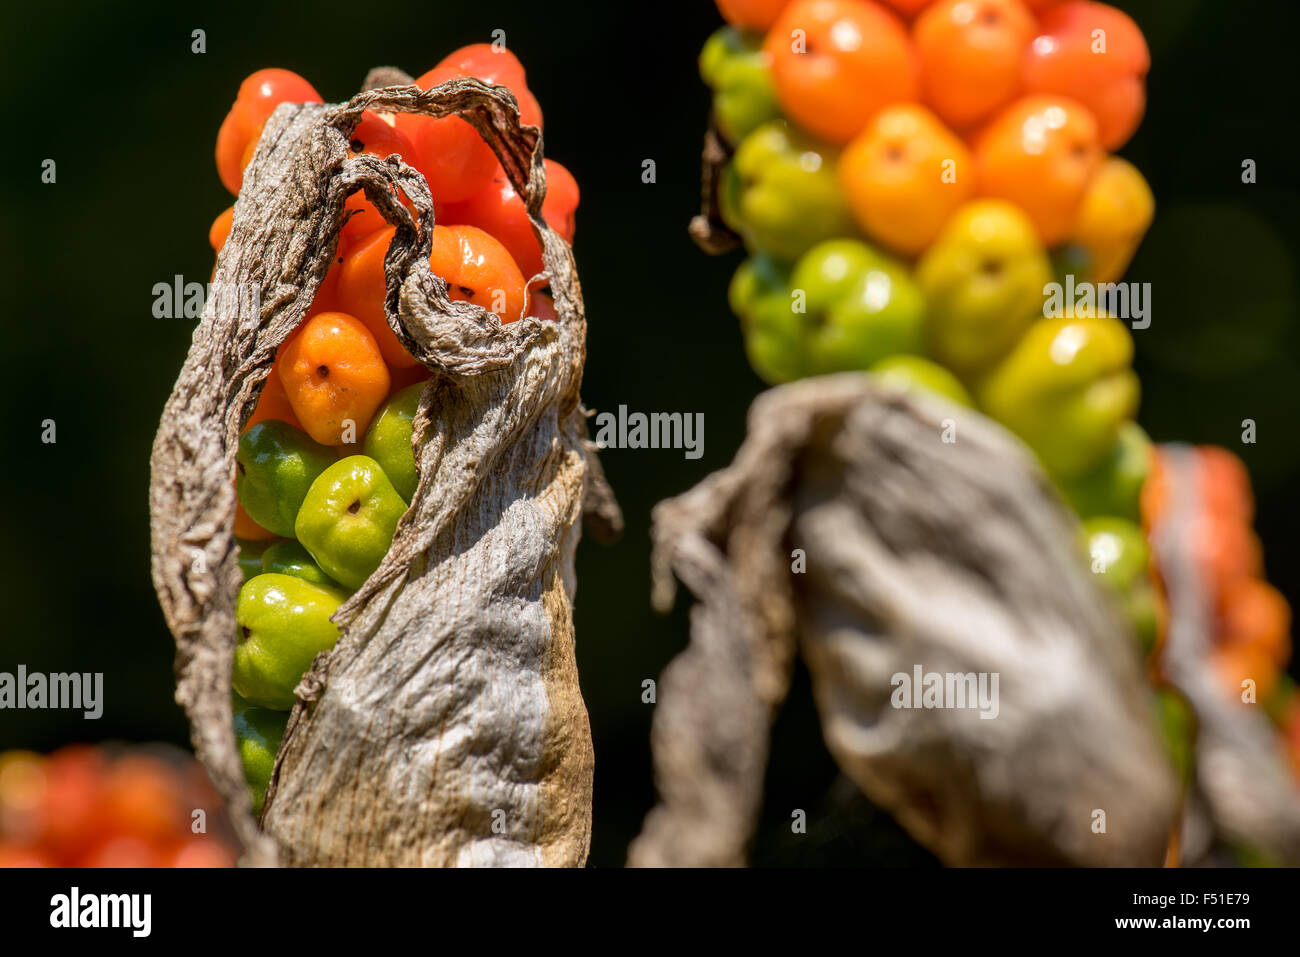 Arum (Arum maculatum) ripe Fruit Stand red green yellow ball standing Stand berries poison garden Gardening medicinal - Stock Image